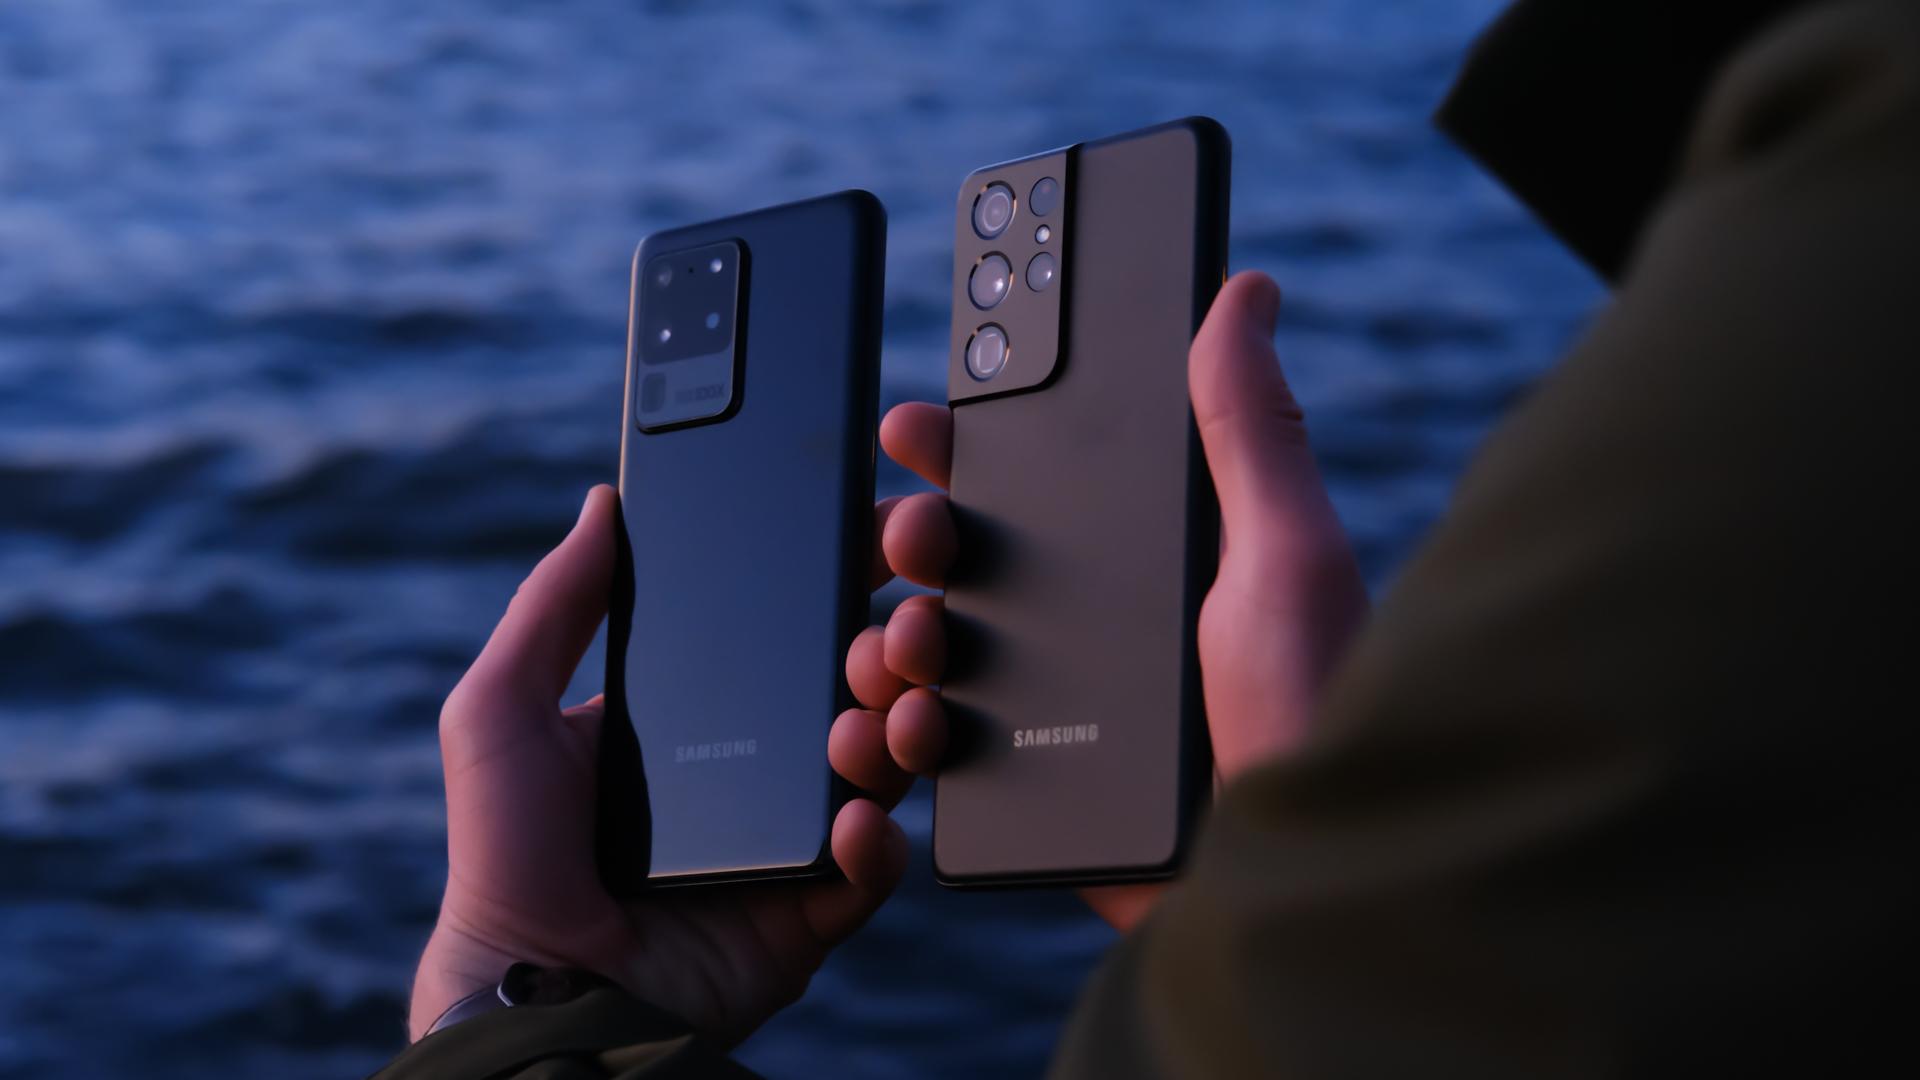 Samsung Galaxy S20 Ultra vs S21 Ultra design